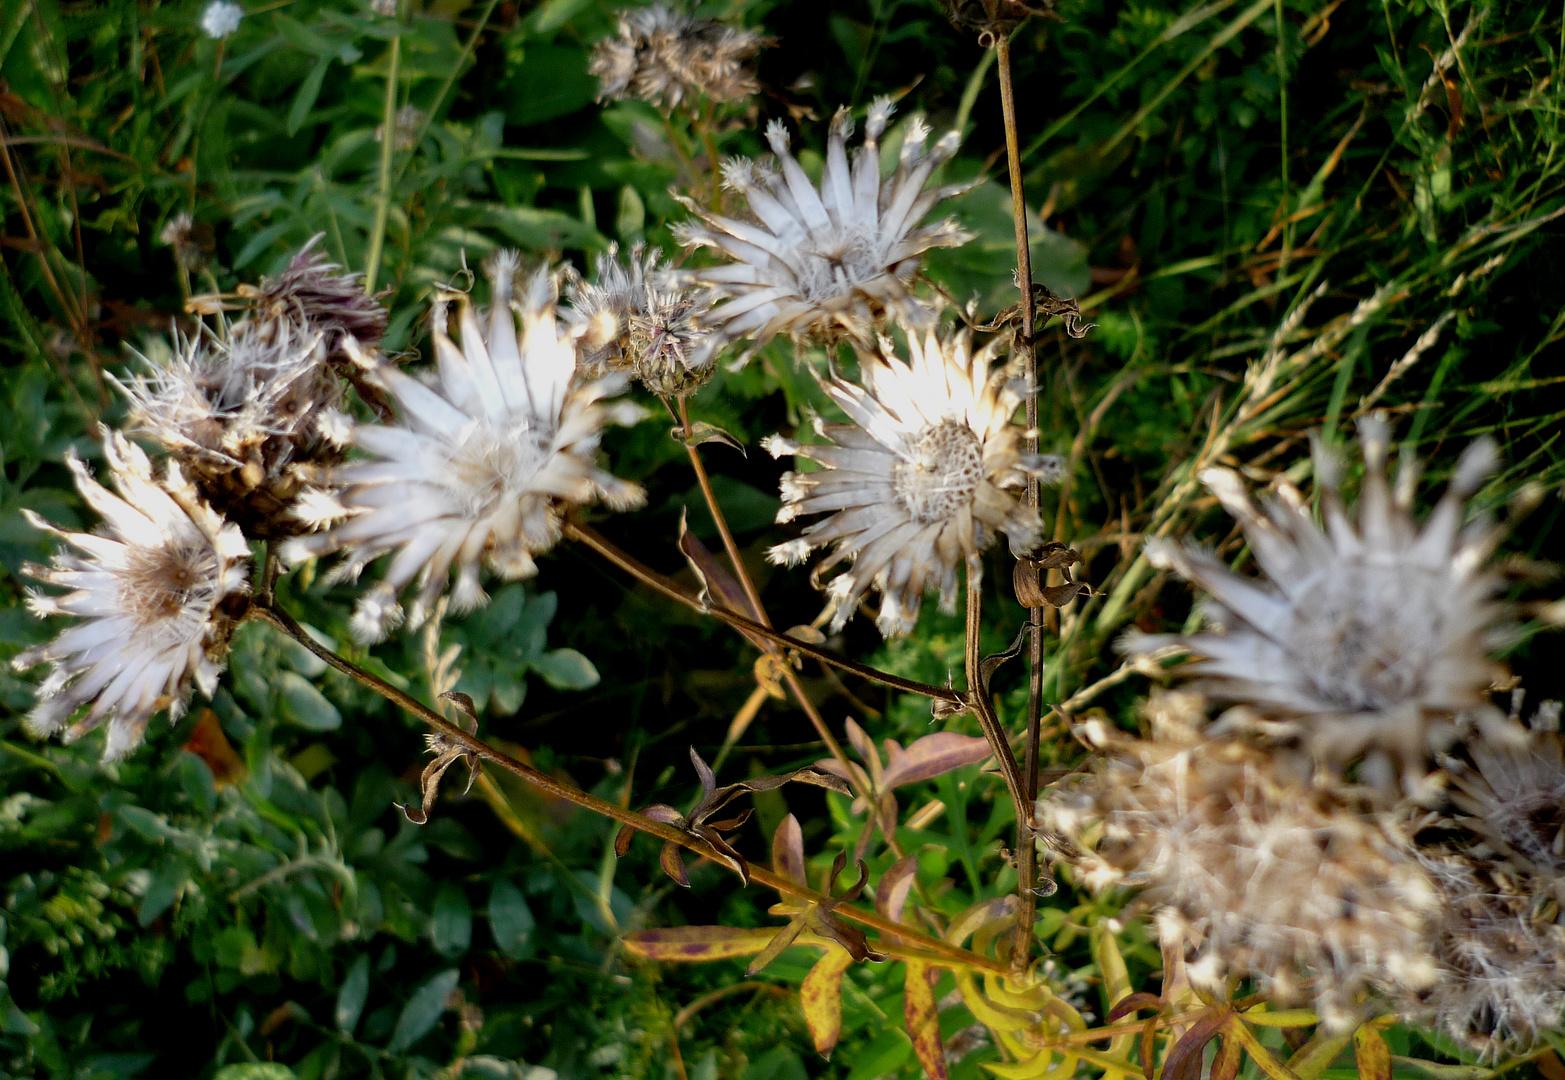 Ehemalige Flockenblumen